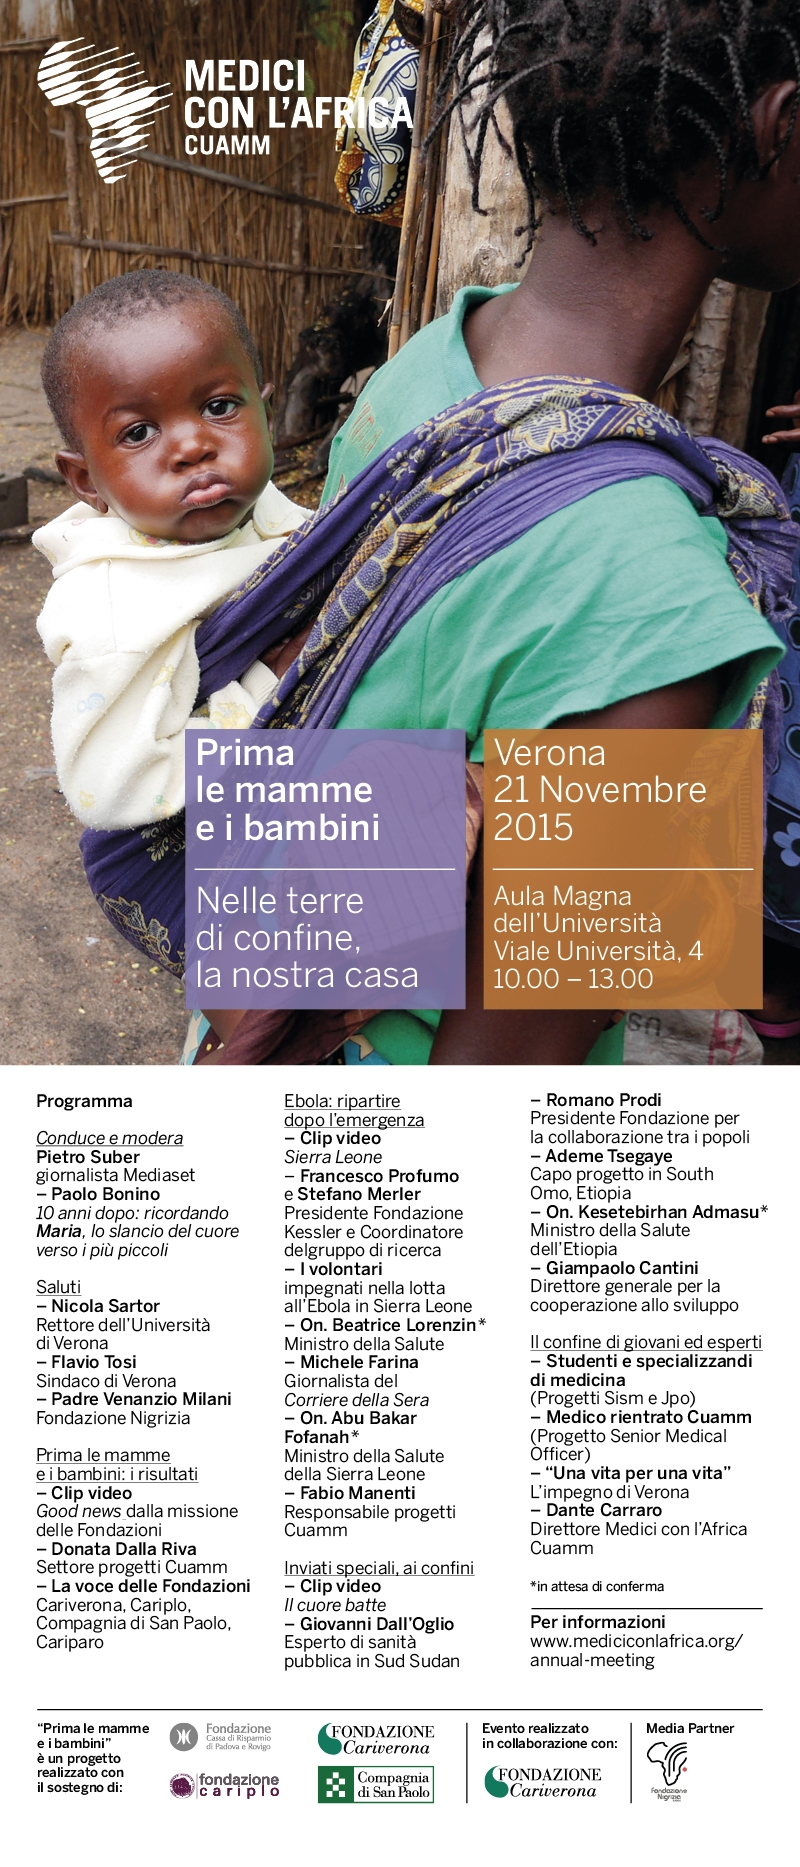 CUAMM_AnnualMeeting_Verona2015